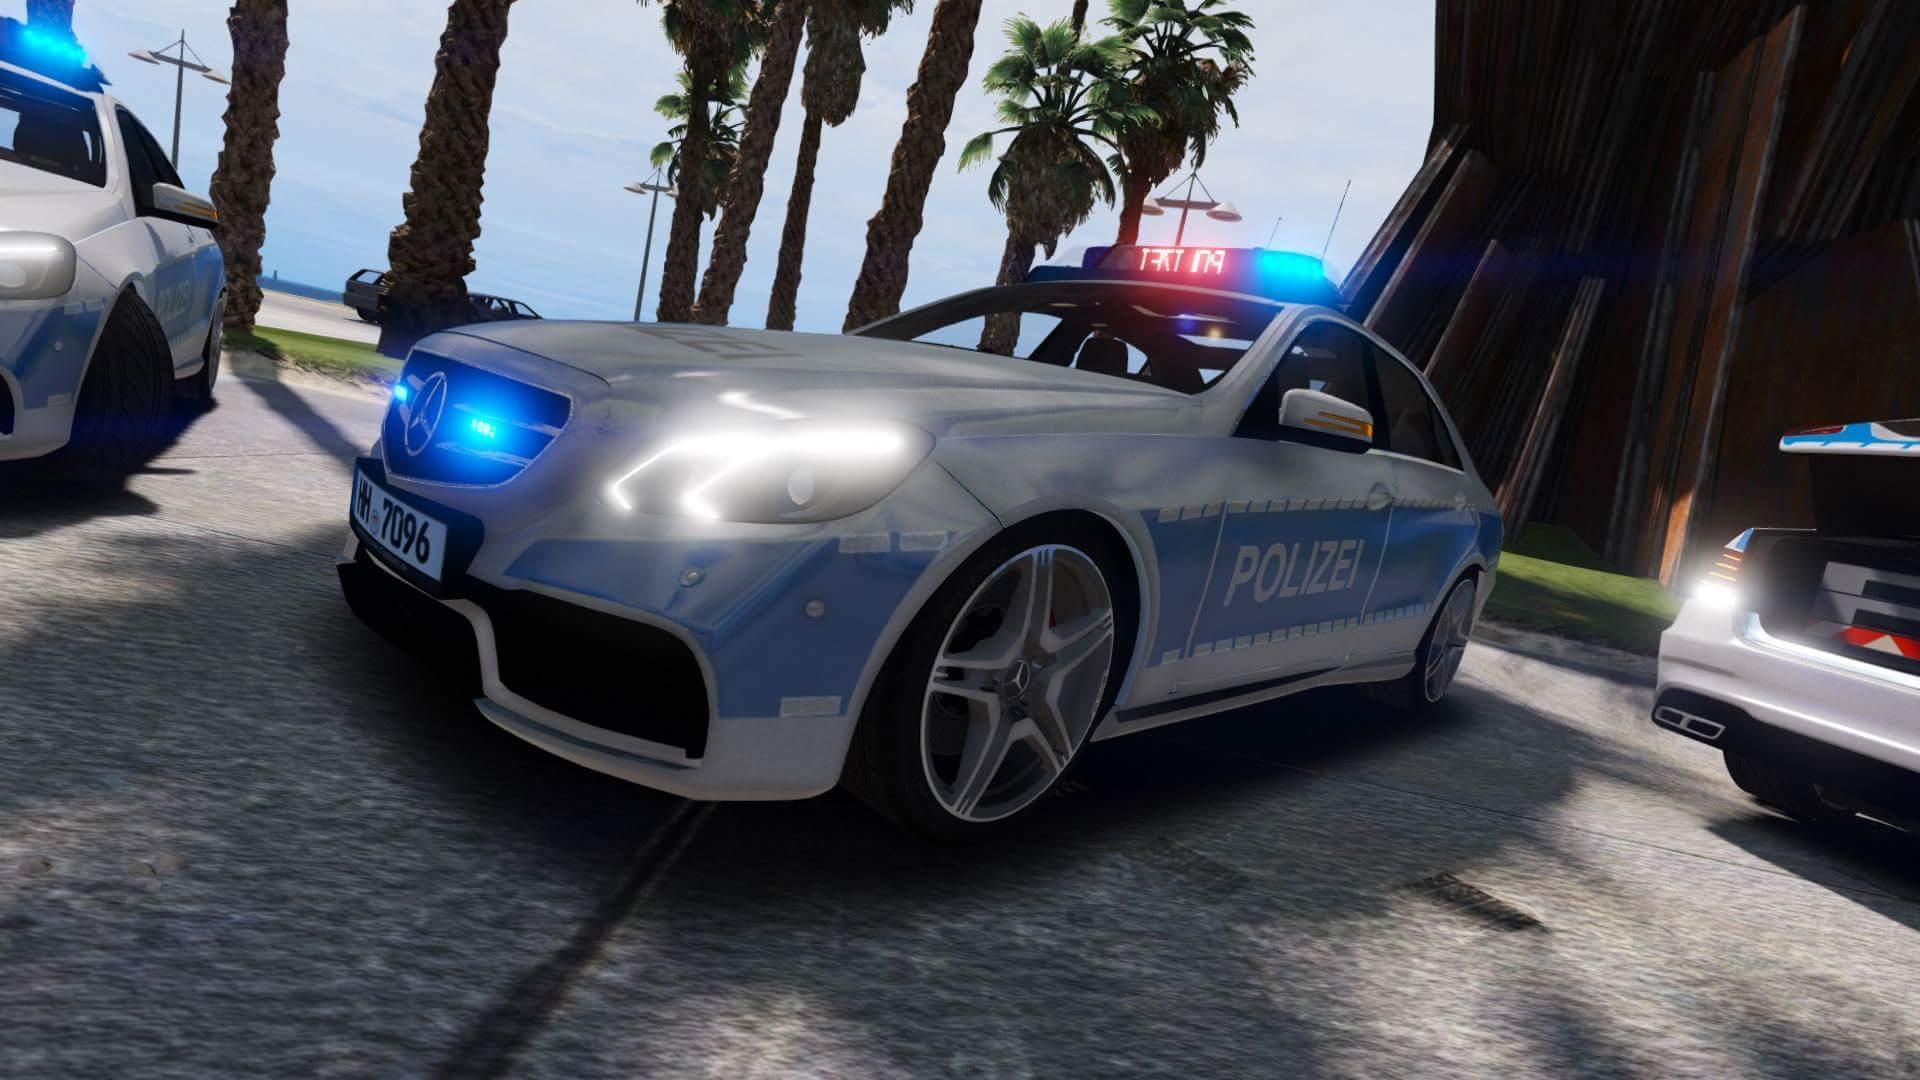 mercedes benz e klasse limousine polizei hamburg els gta5. Black Bedroom Furniture Sets. Home Design Ideas